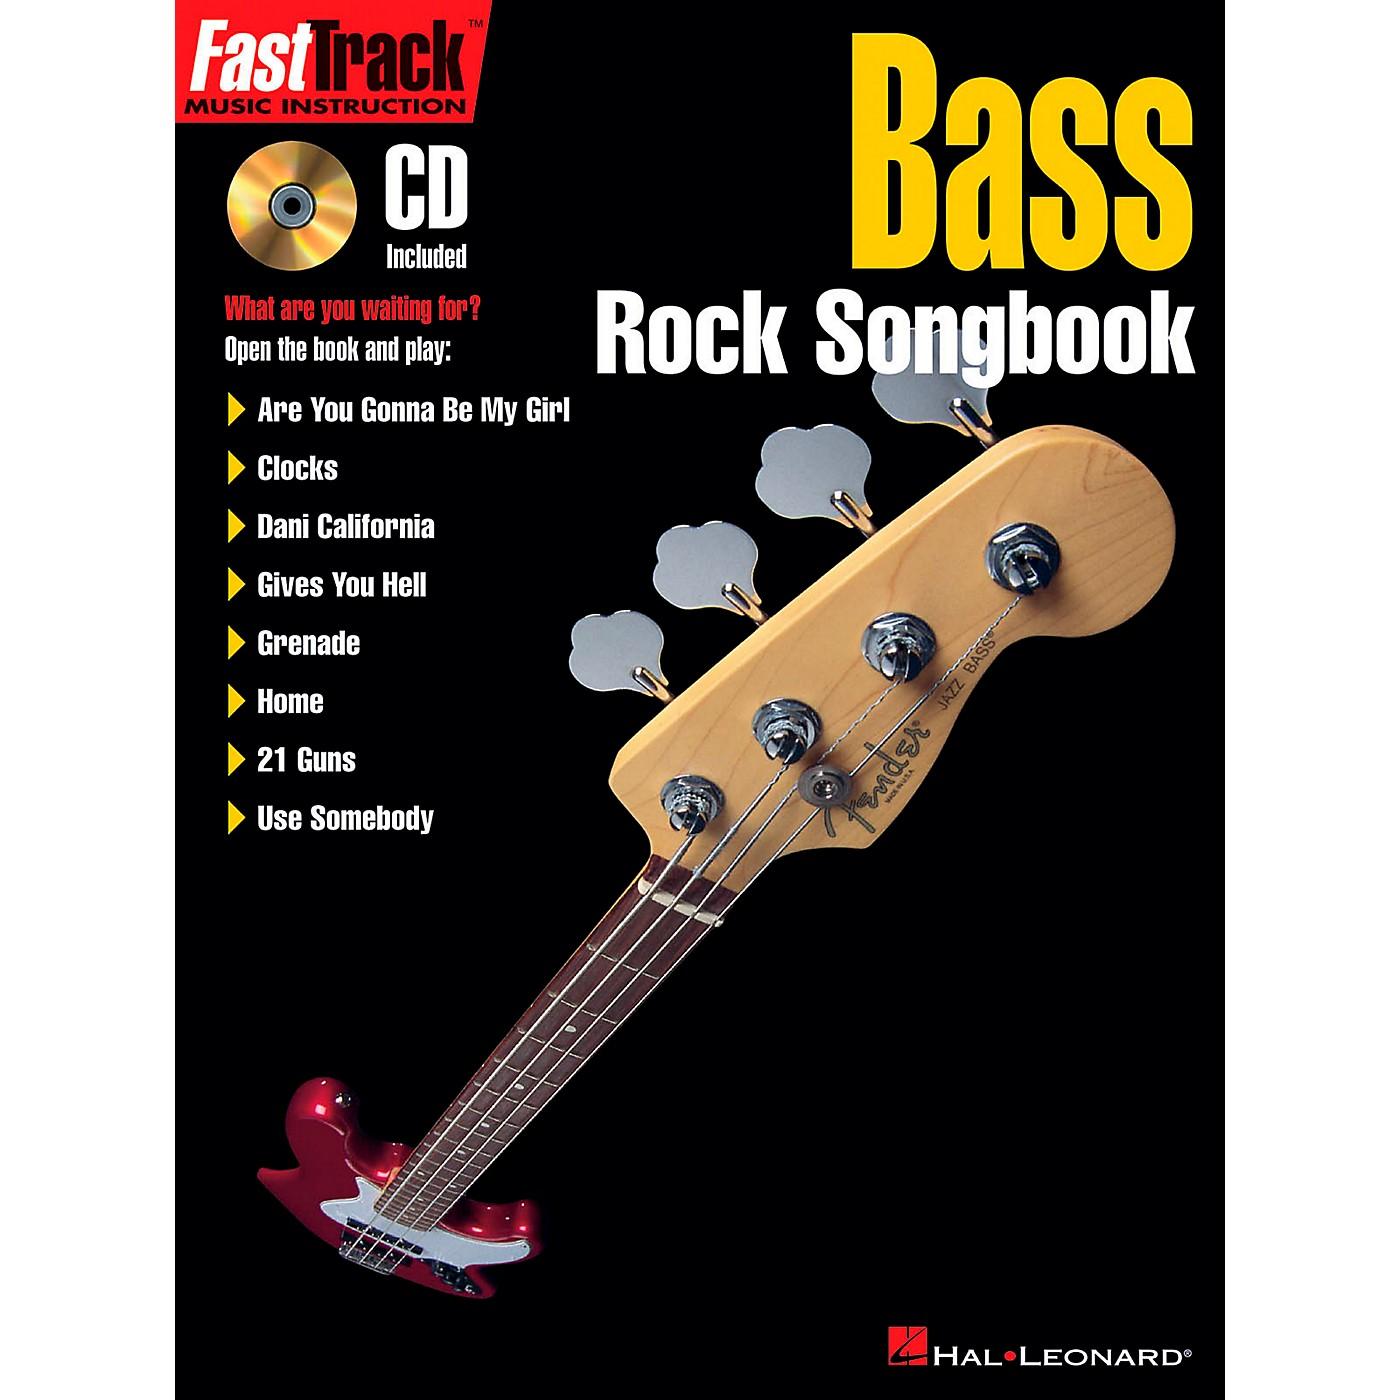 Hal Leonard FastTrack Bass Rock Songbook Book/CD thumbnail